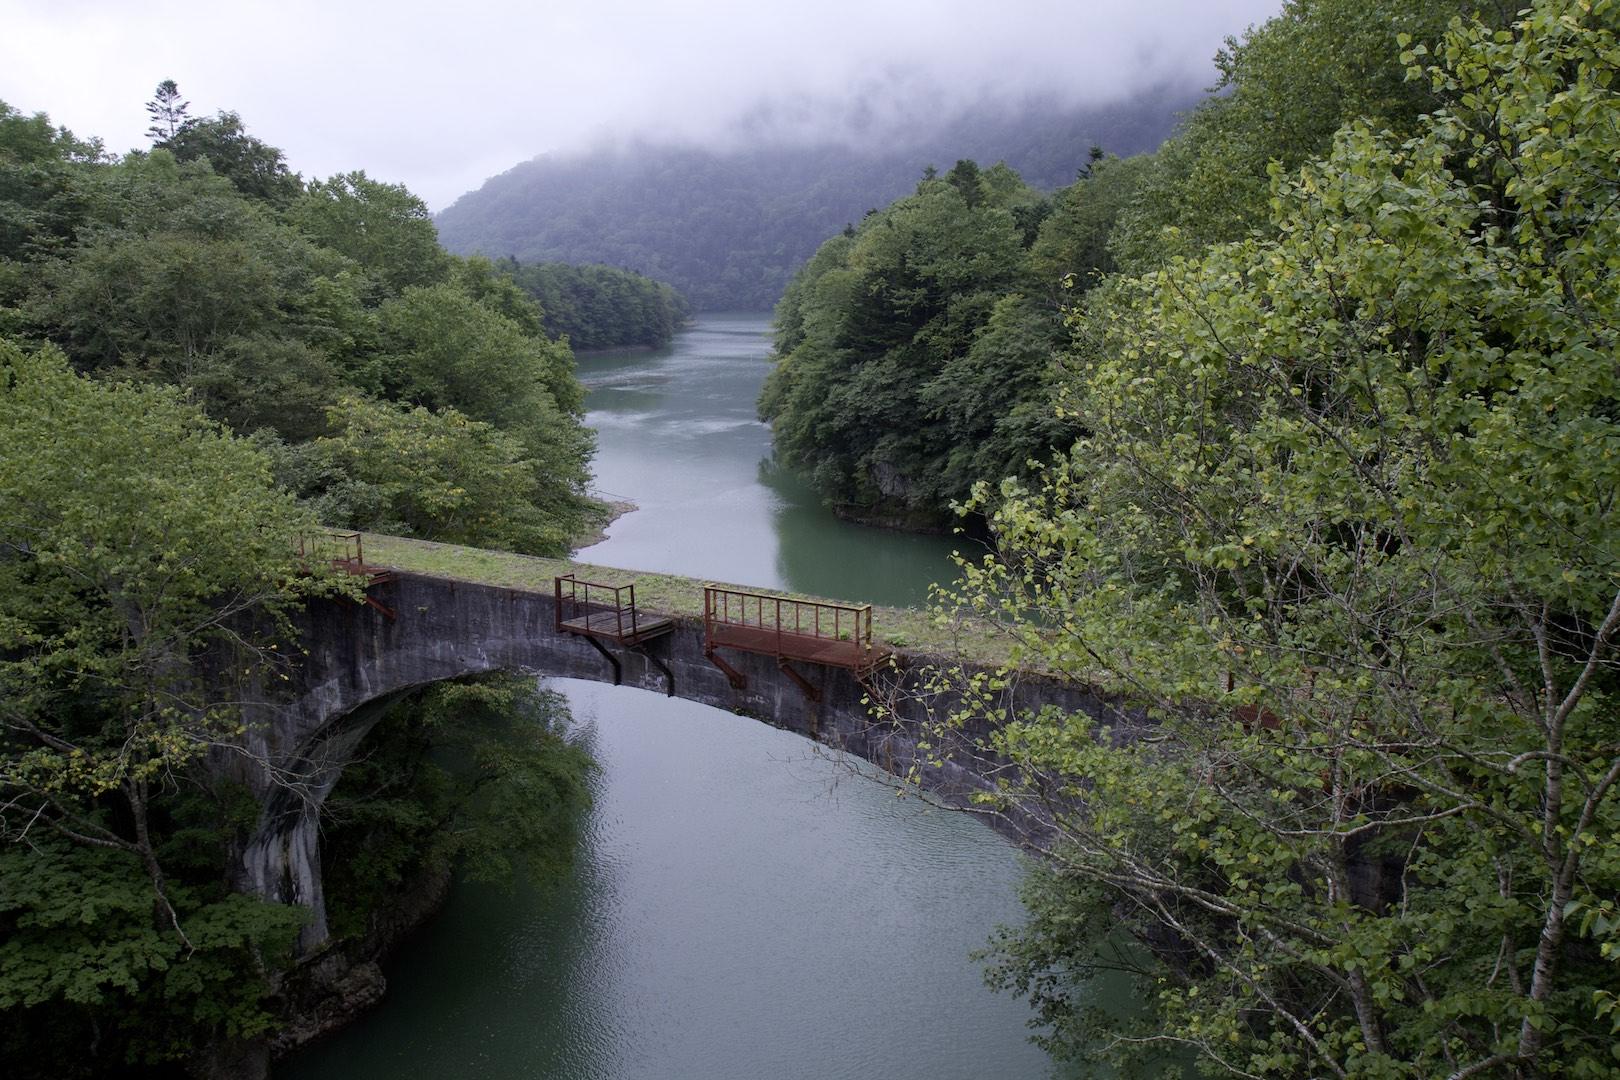 Otofukekawa Bridge, Nukabira